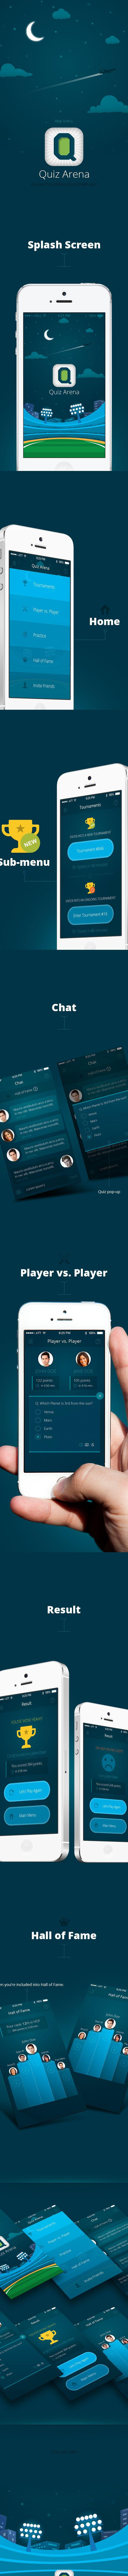 Quiz Arena | Mobile Game Design on Behance